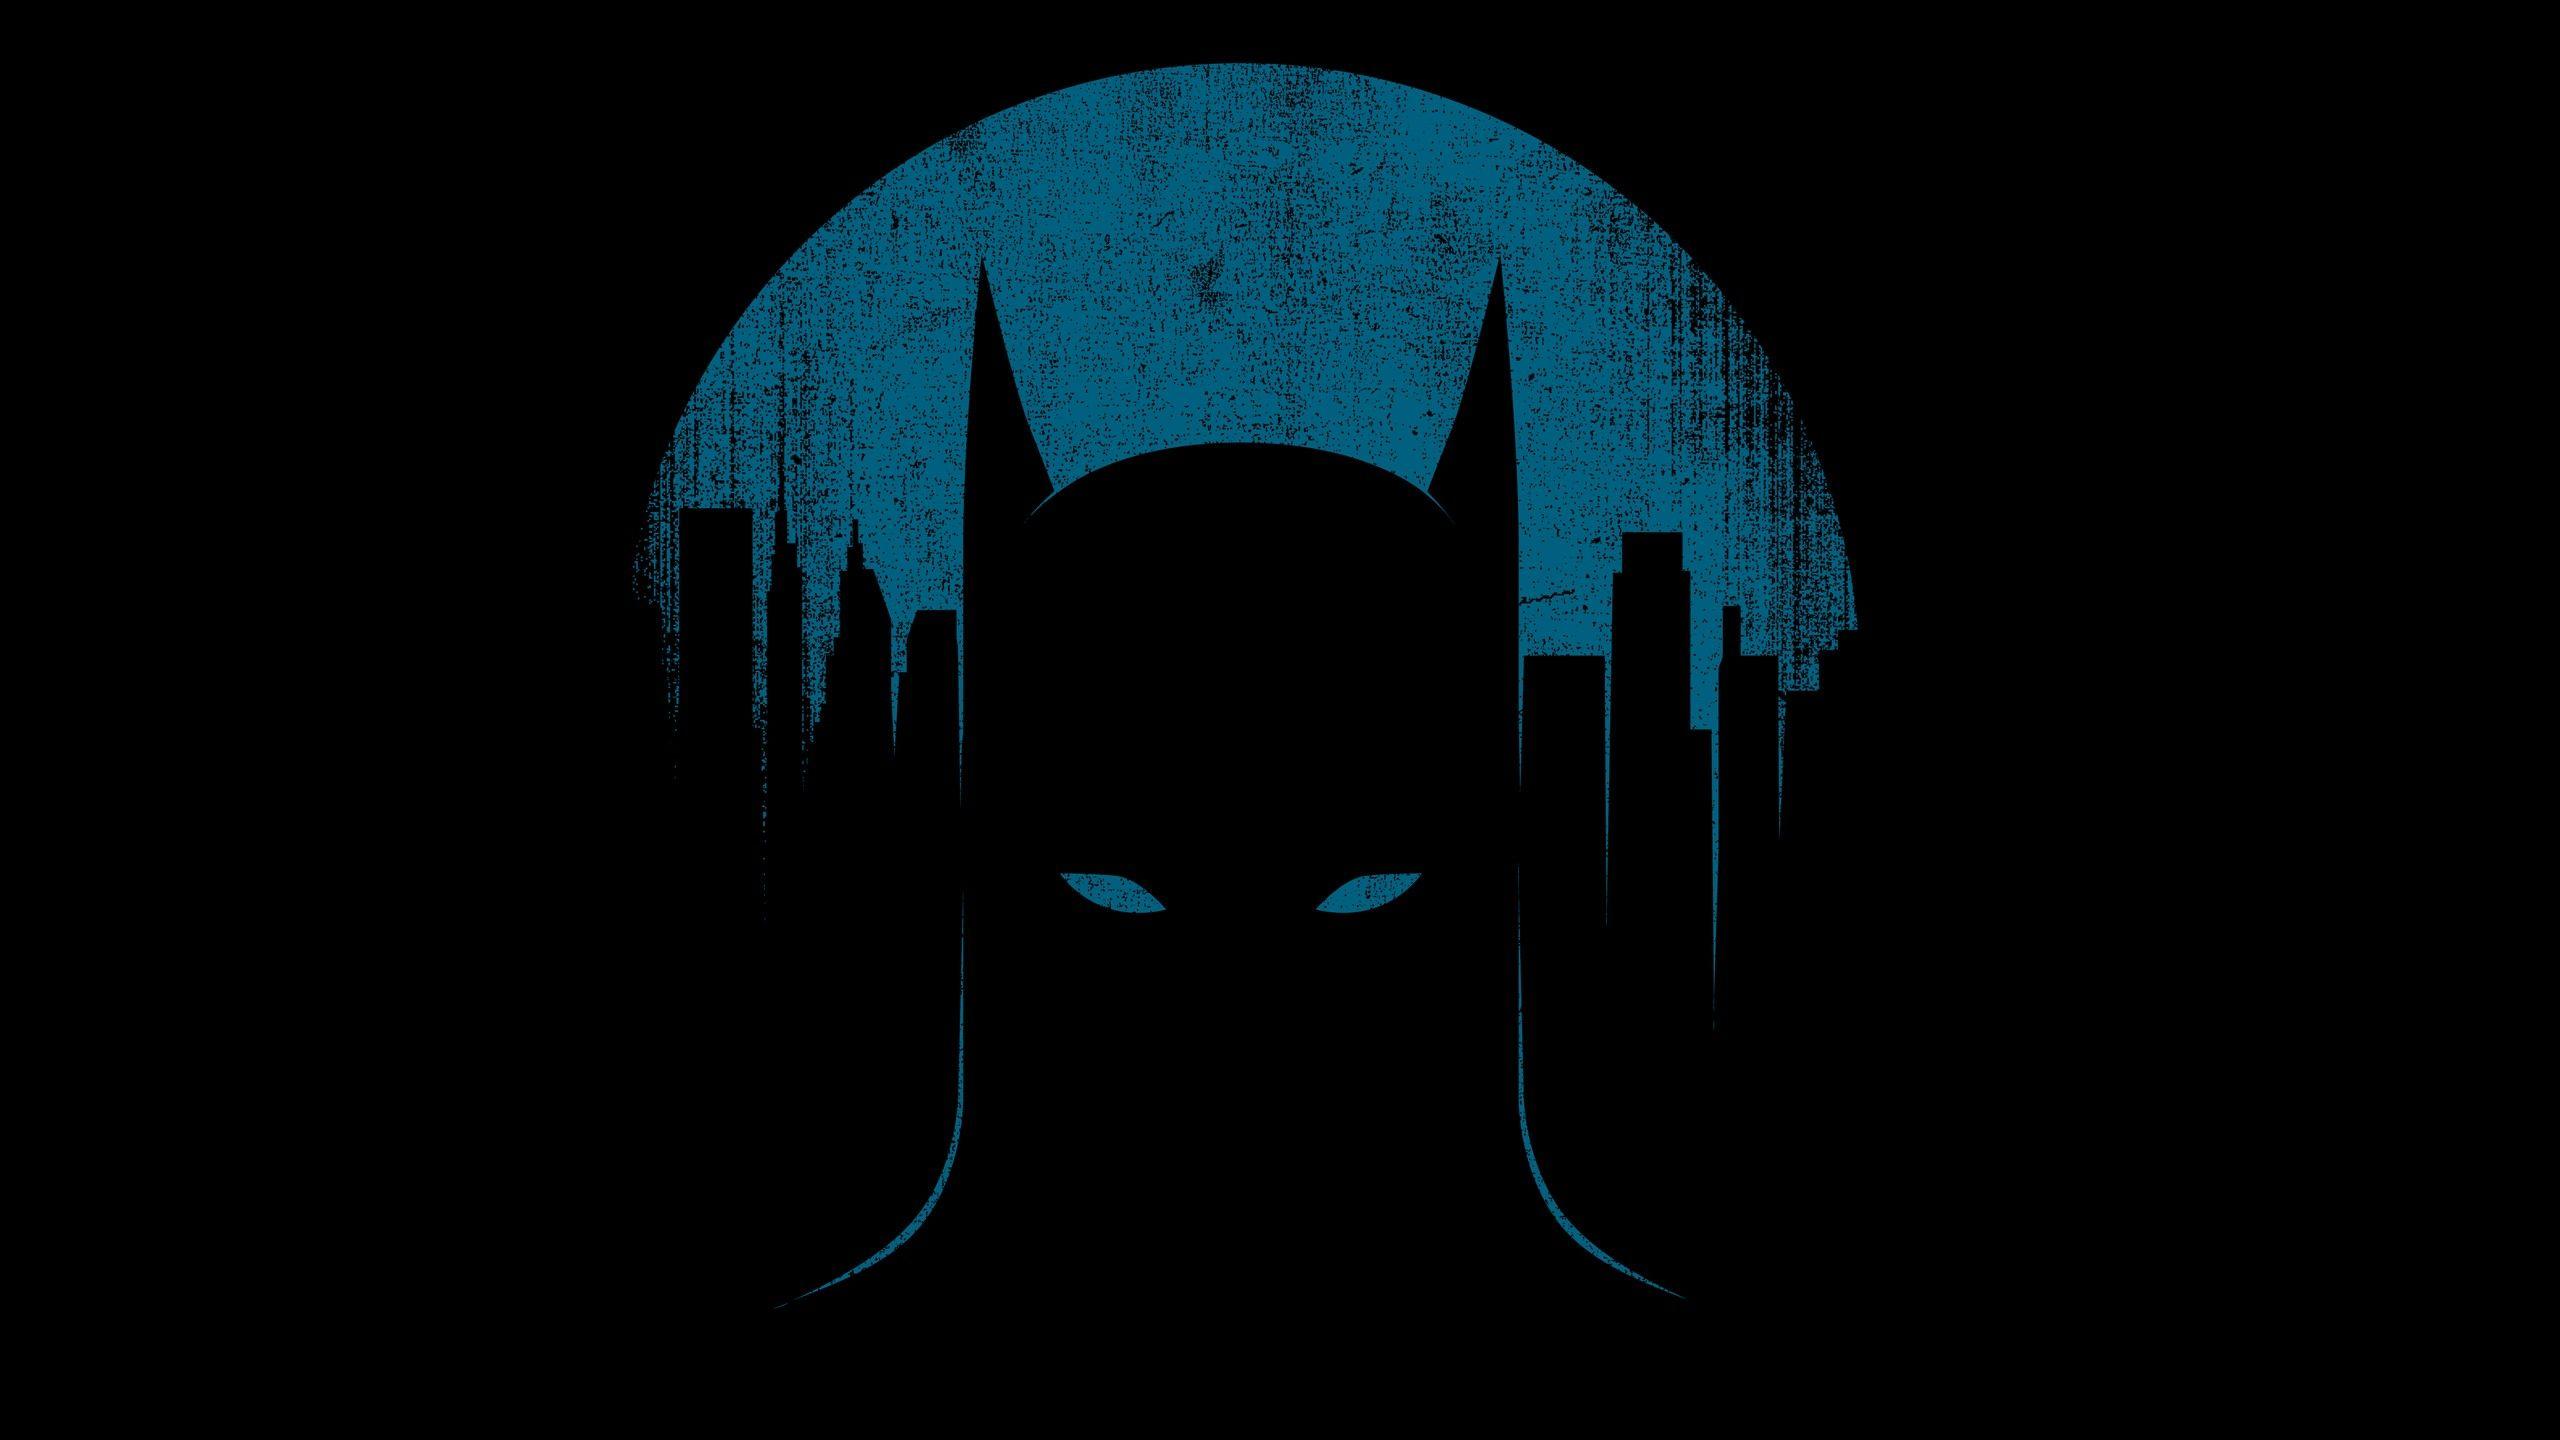 Phone Batman Winter Black Mobile Wallpaper Wallpapers Black Wallpaper Is An Android App For Phones And Tablet Batman Batman Wallpaper Batman Arkham Origins